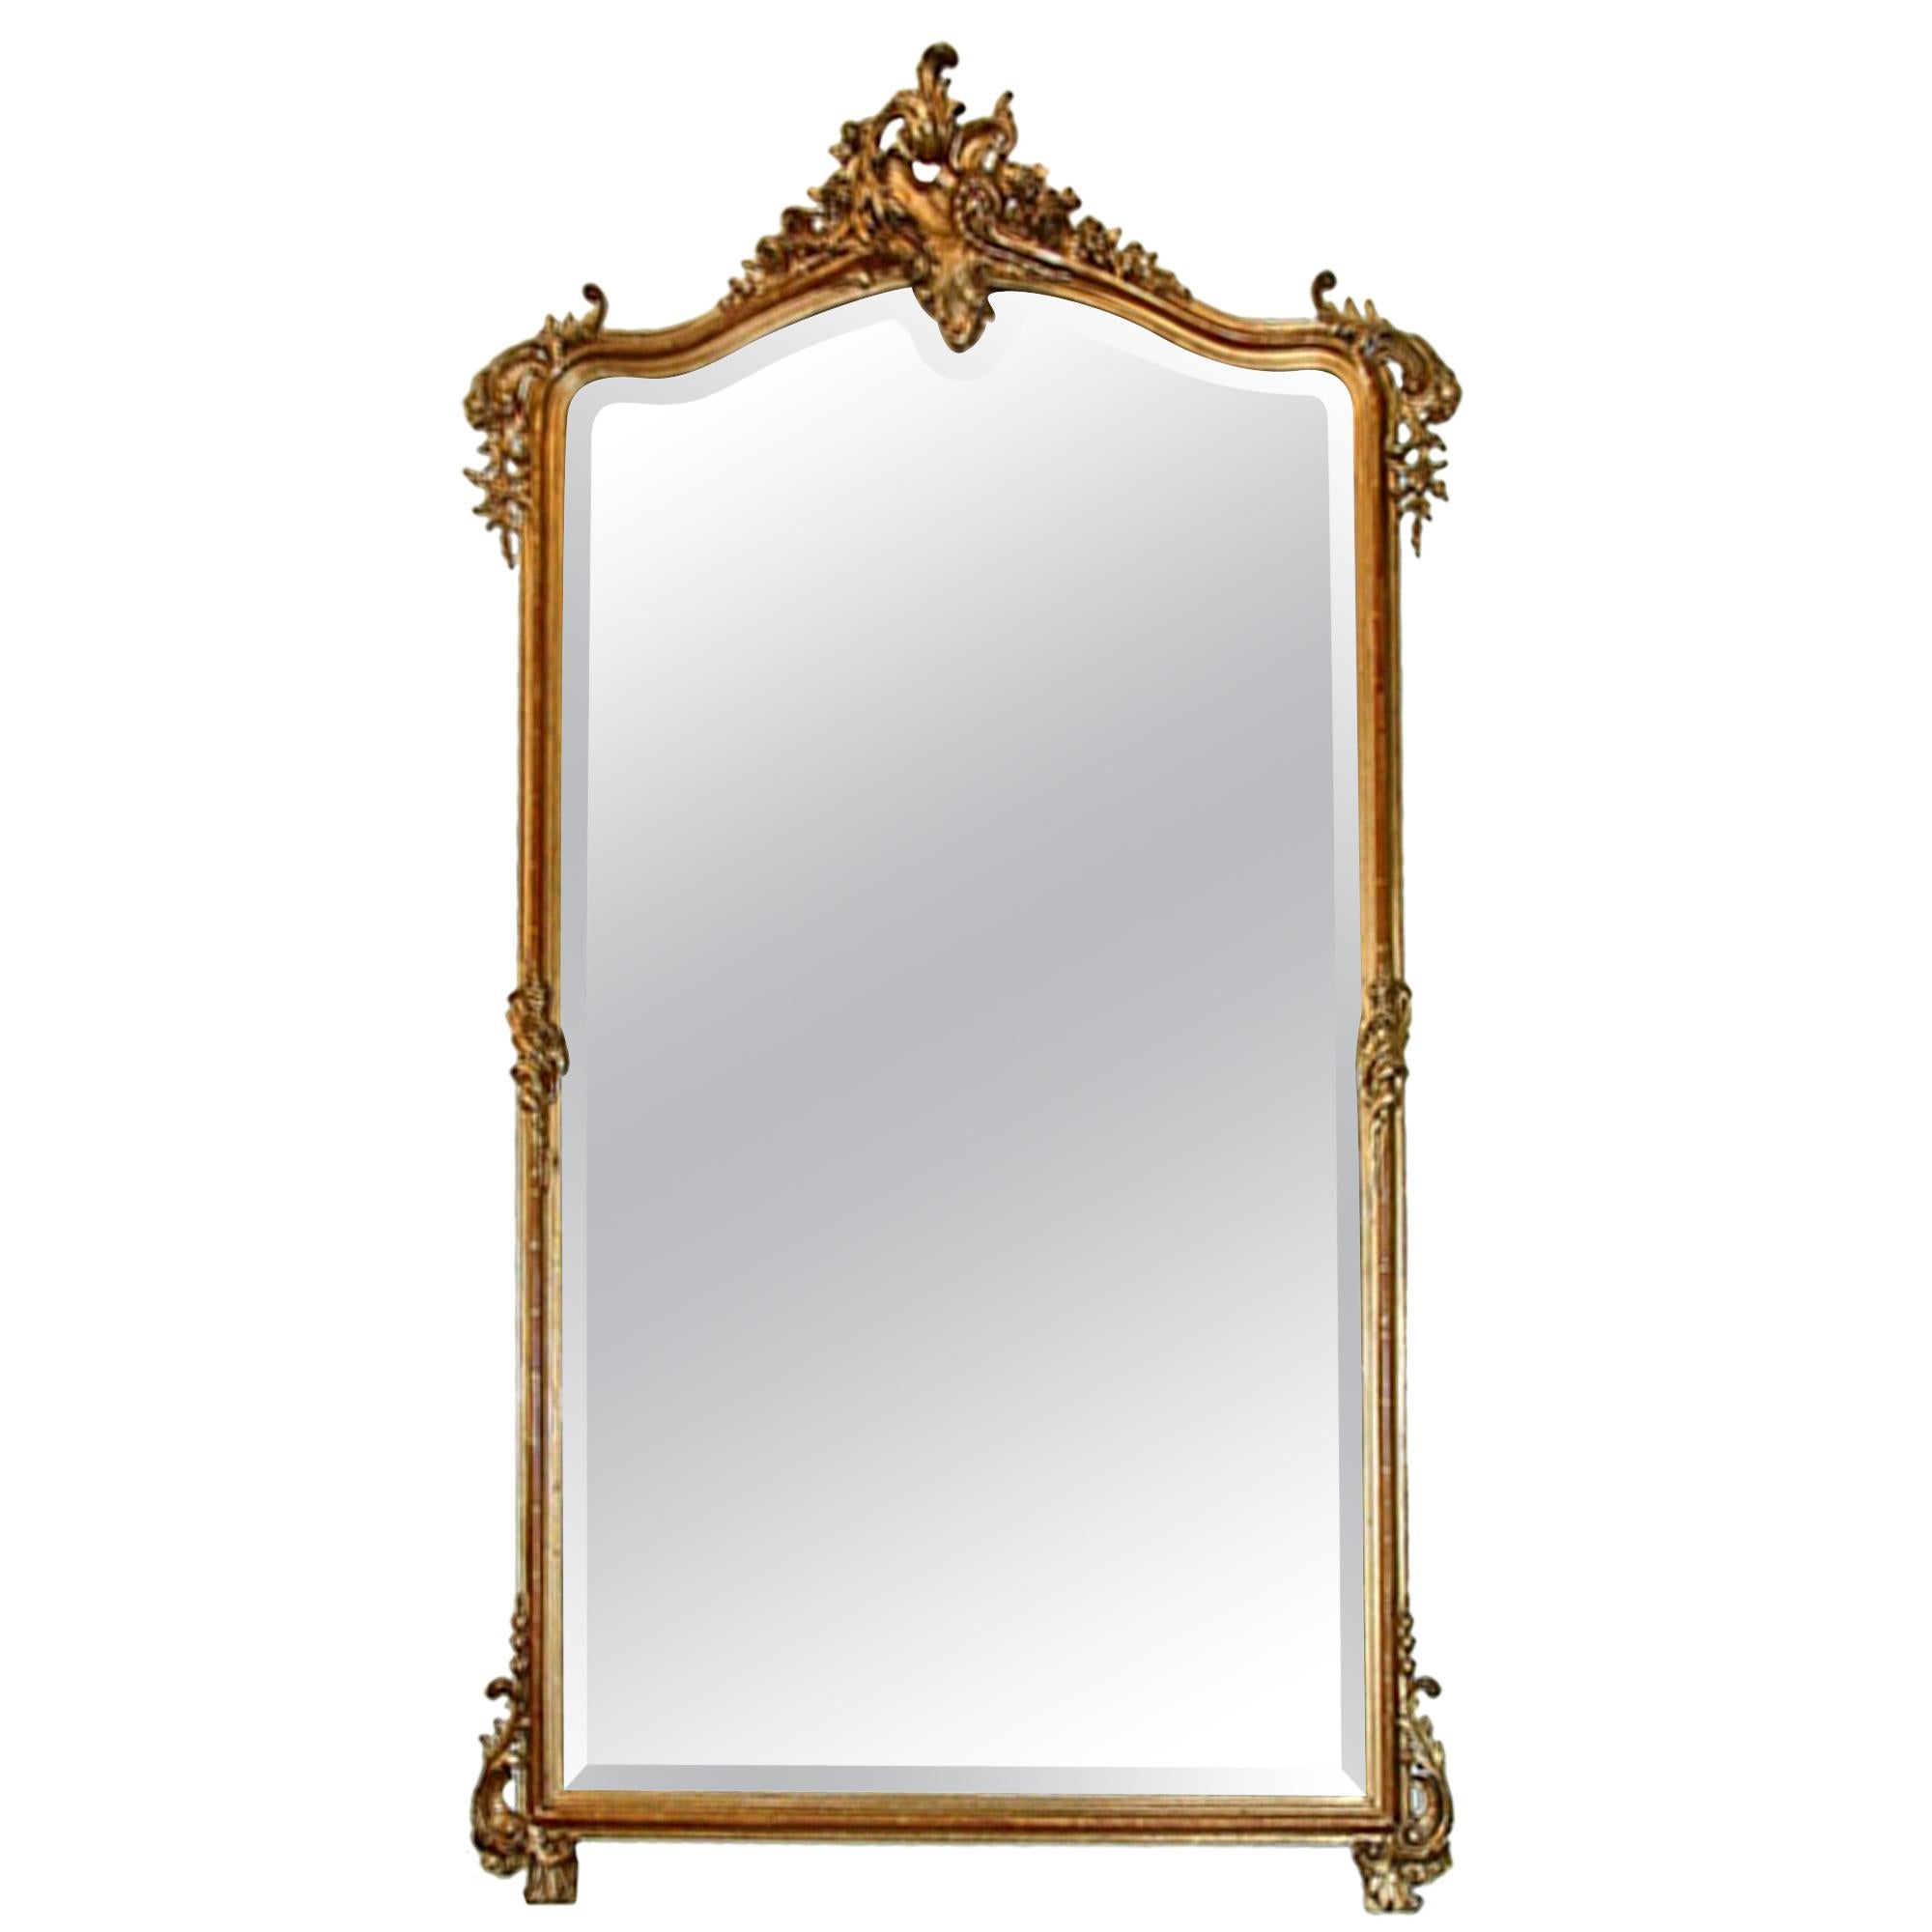 French 19th Century Louis XV Style Giltwood Mirror